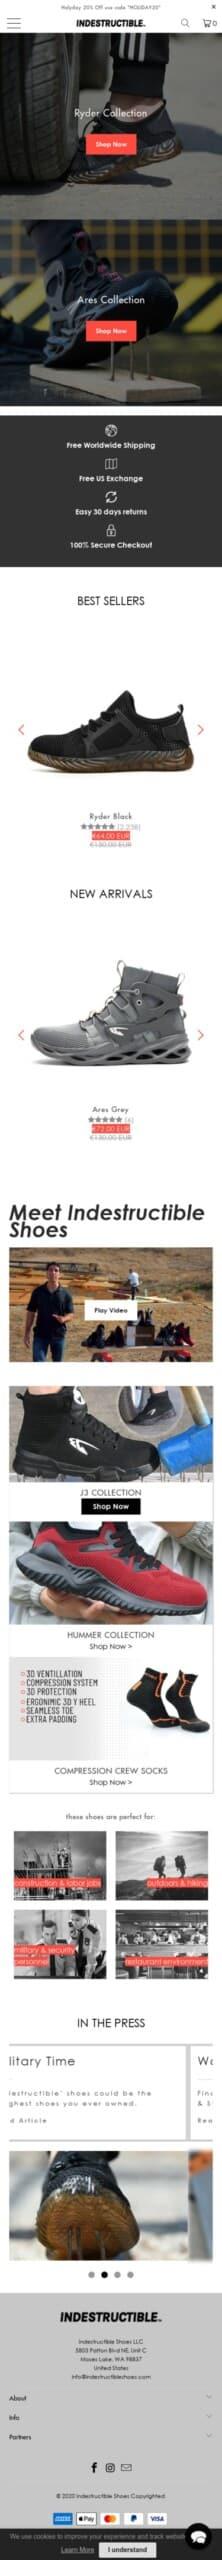 Indestructible Shoes LLC Coupon